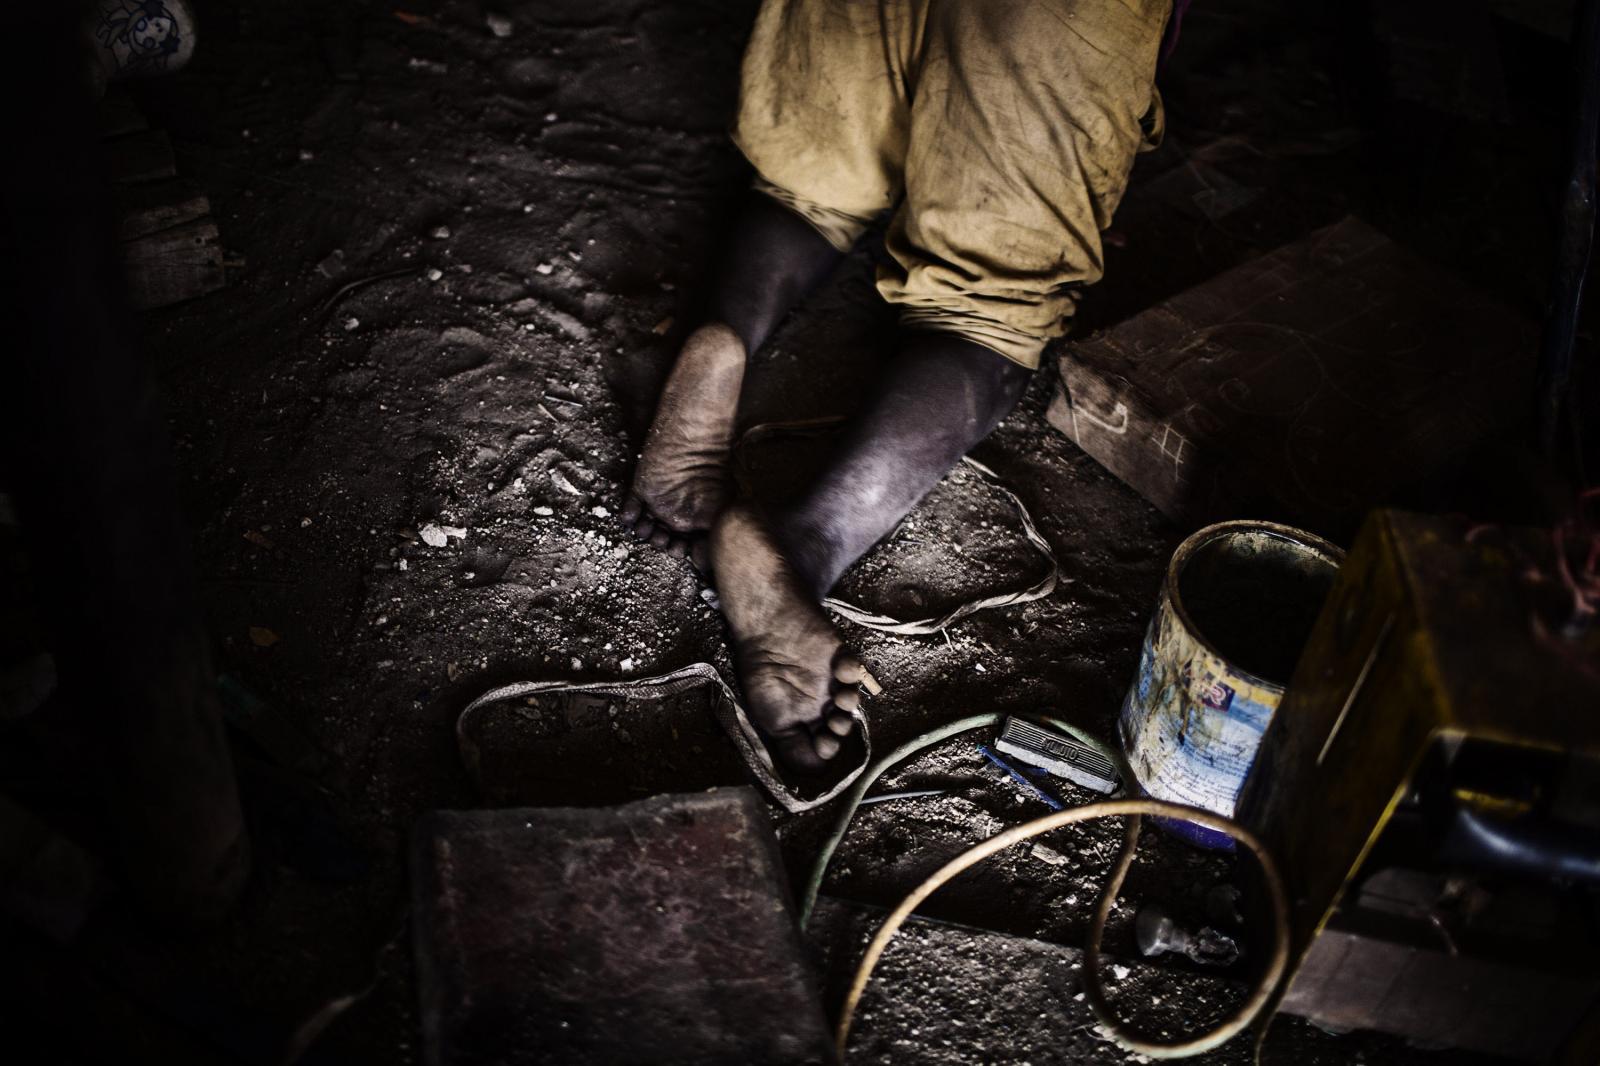 Photography image - Loading parasoccer-Nigeria-003.jpg